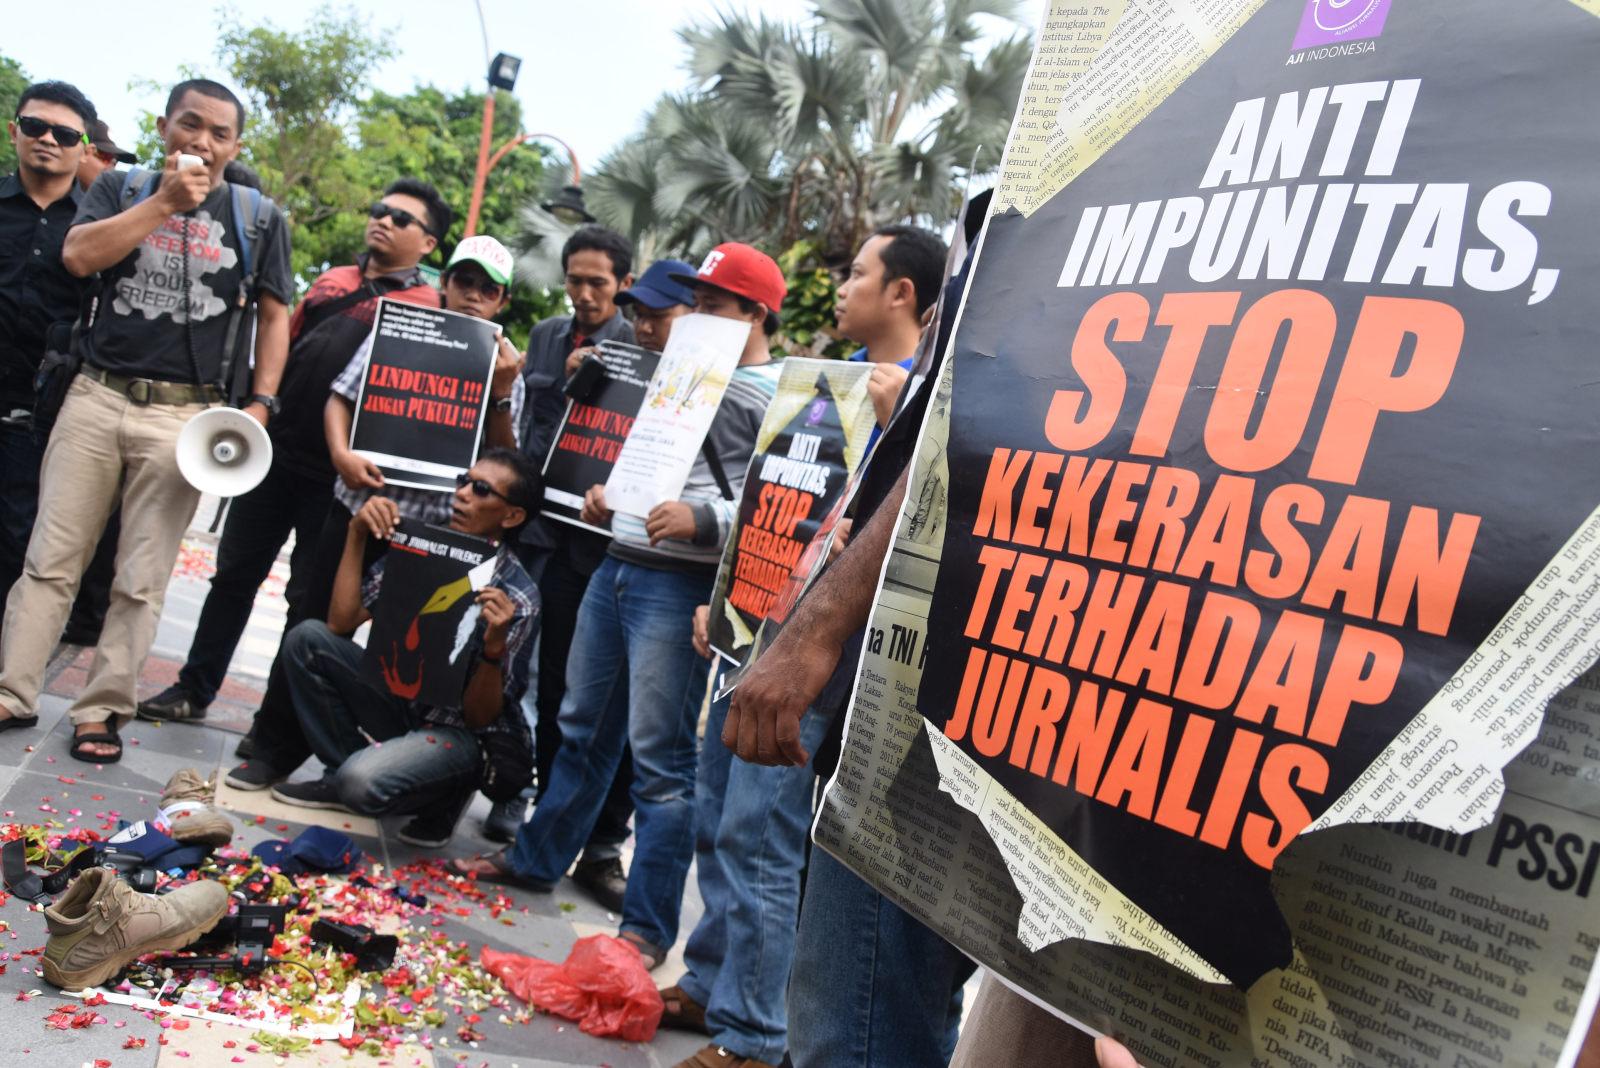 AJI Kecam Tindakan Anggota FPI yang Pukul Jurnalis Tirto.id